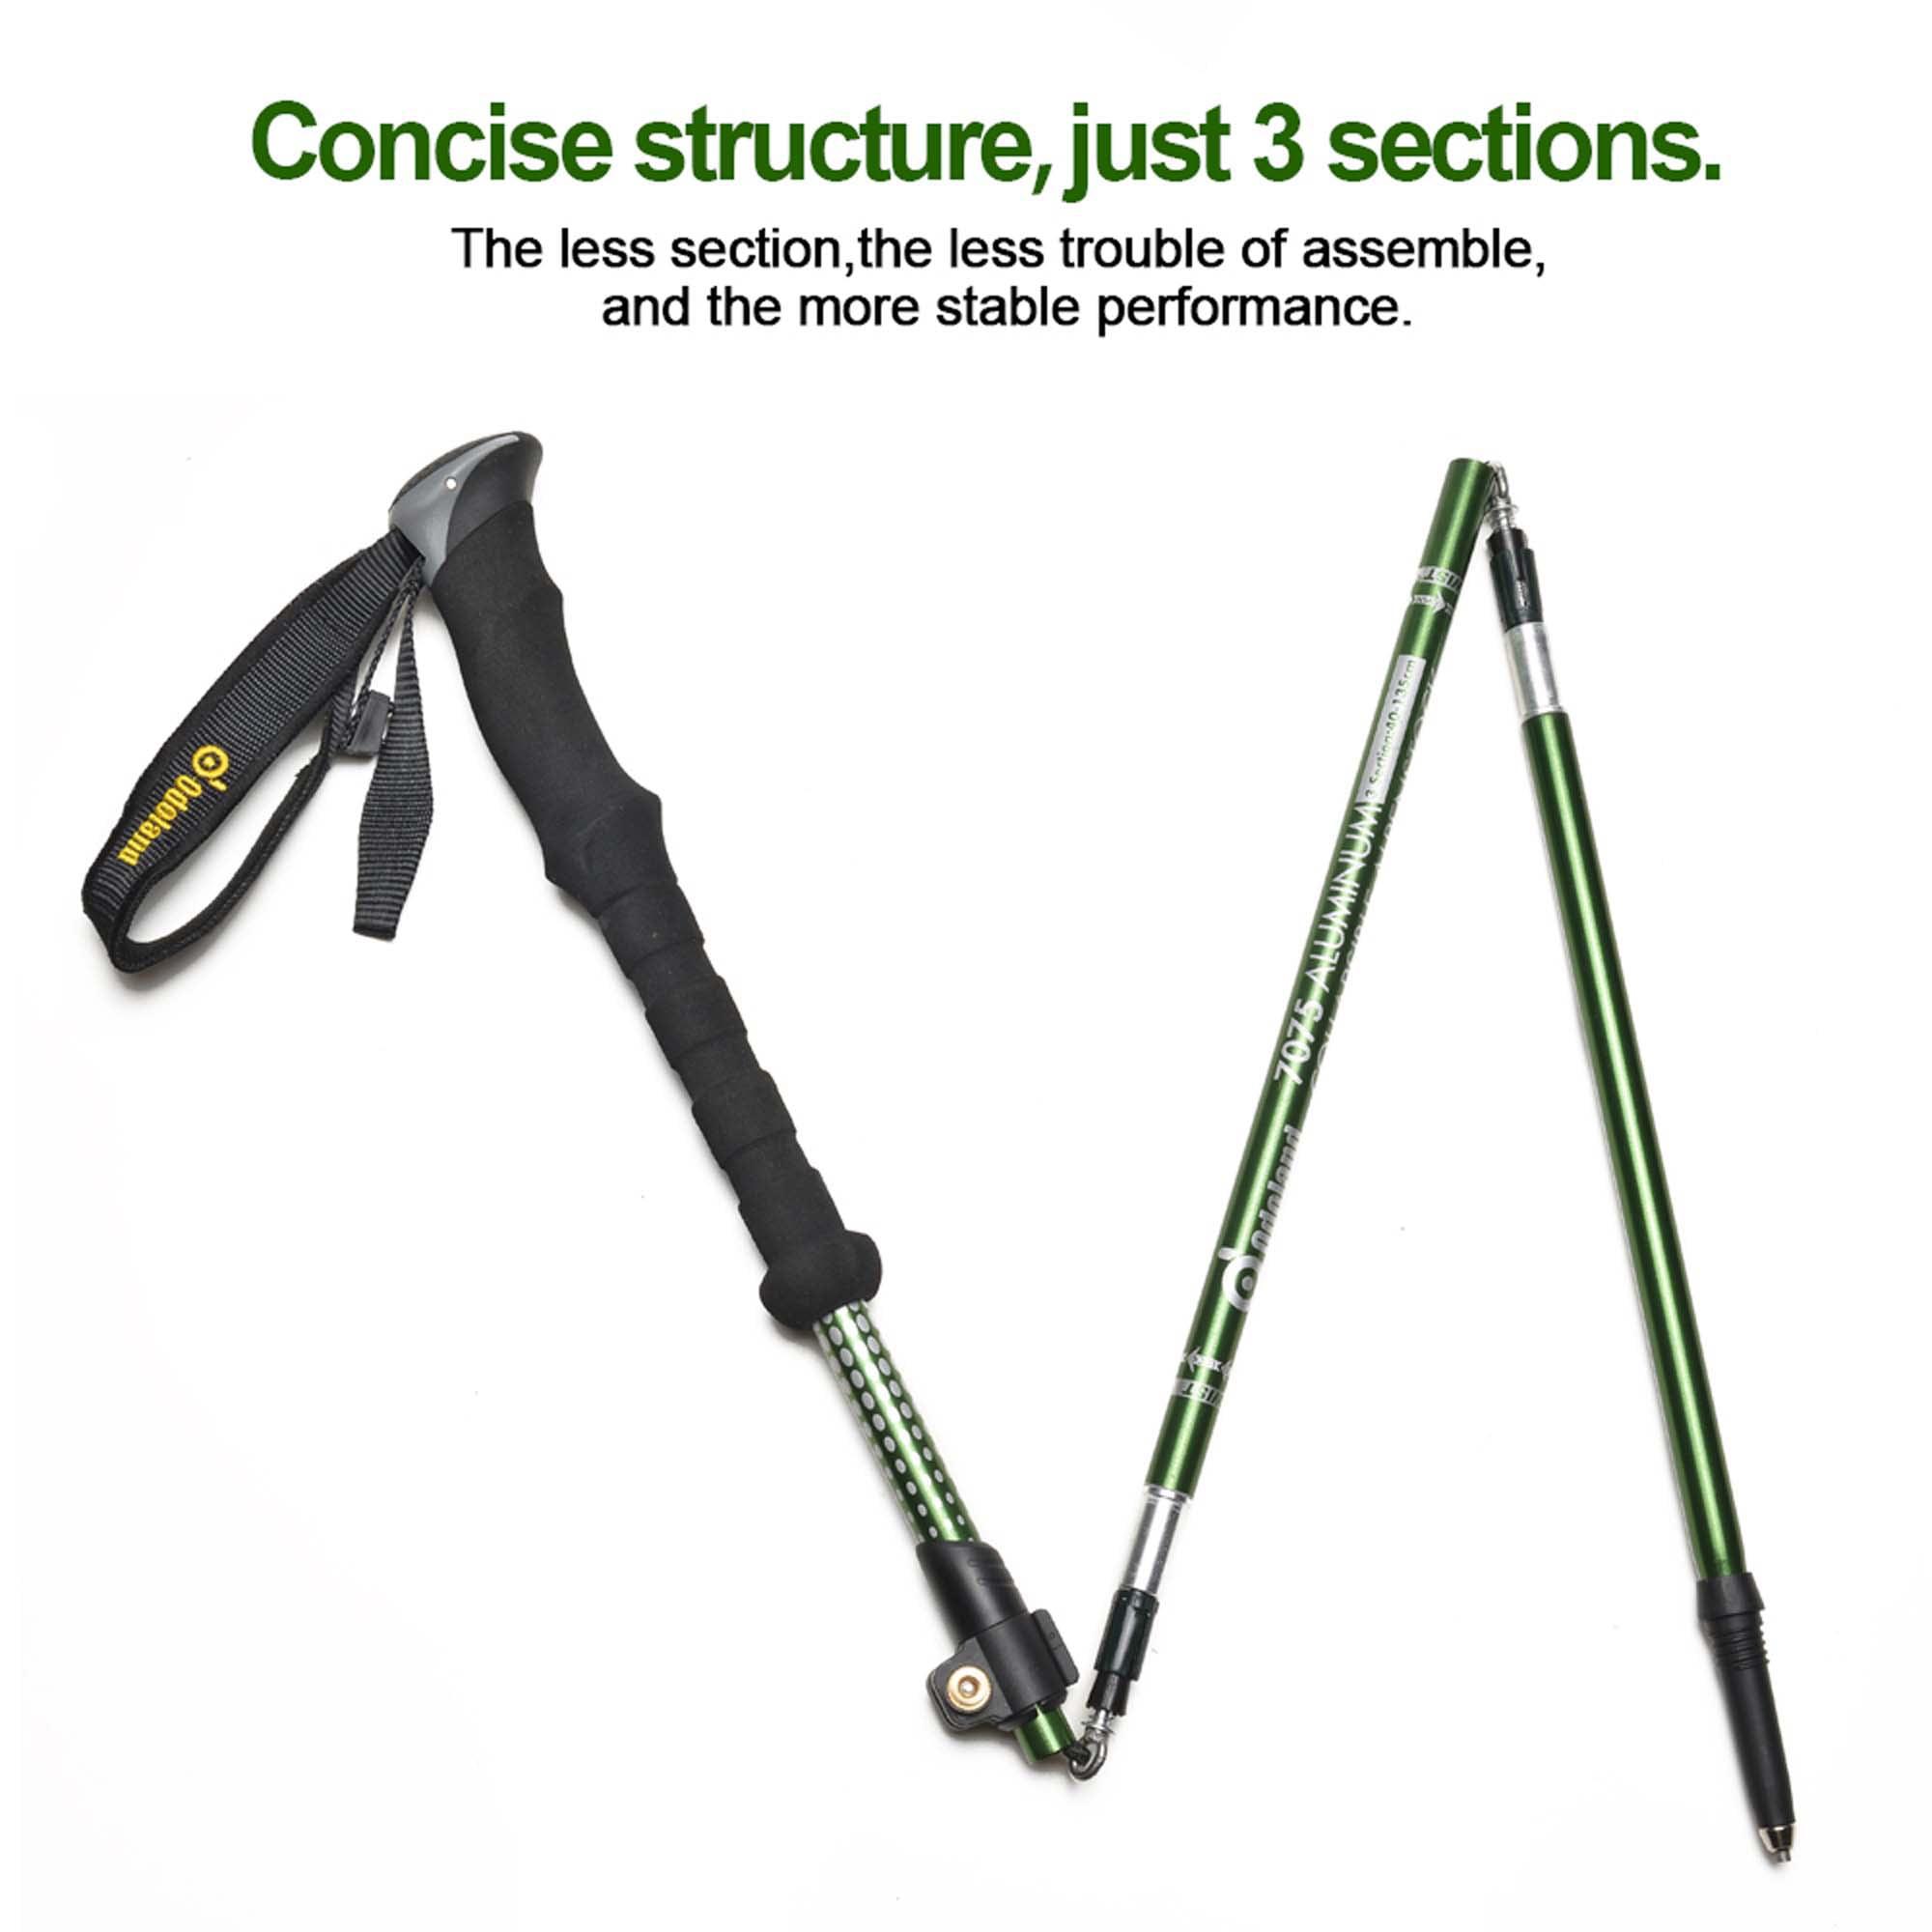 Click here to buy AGPtek Folding Telescoping Trekking Pole Alpenstocks Ultralight Adjustable Hiking Stick.